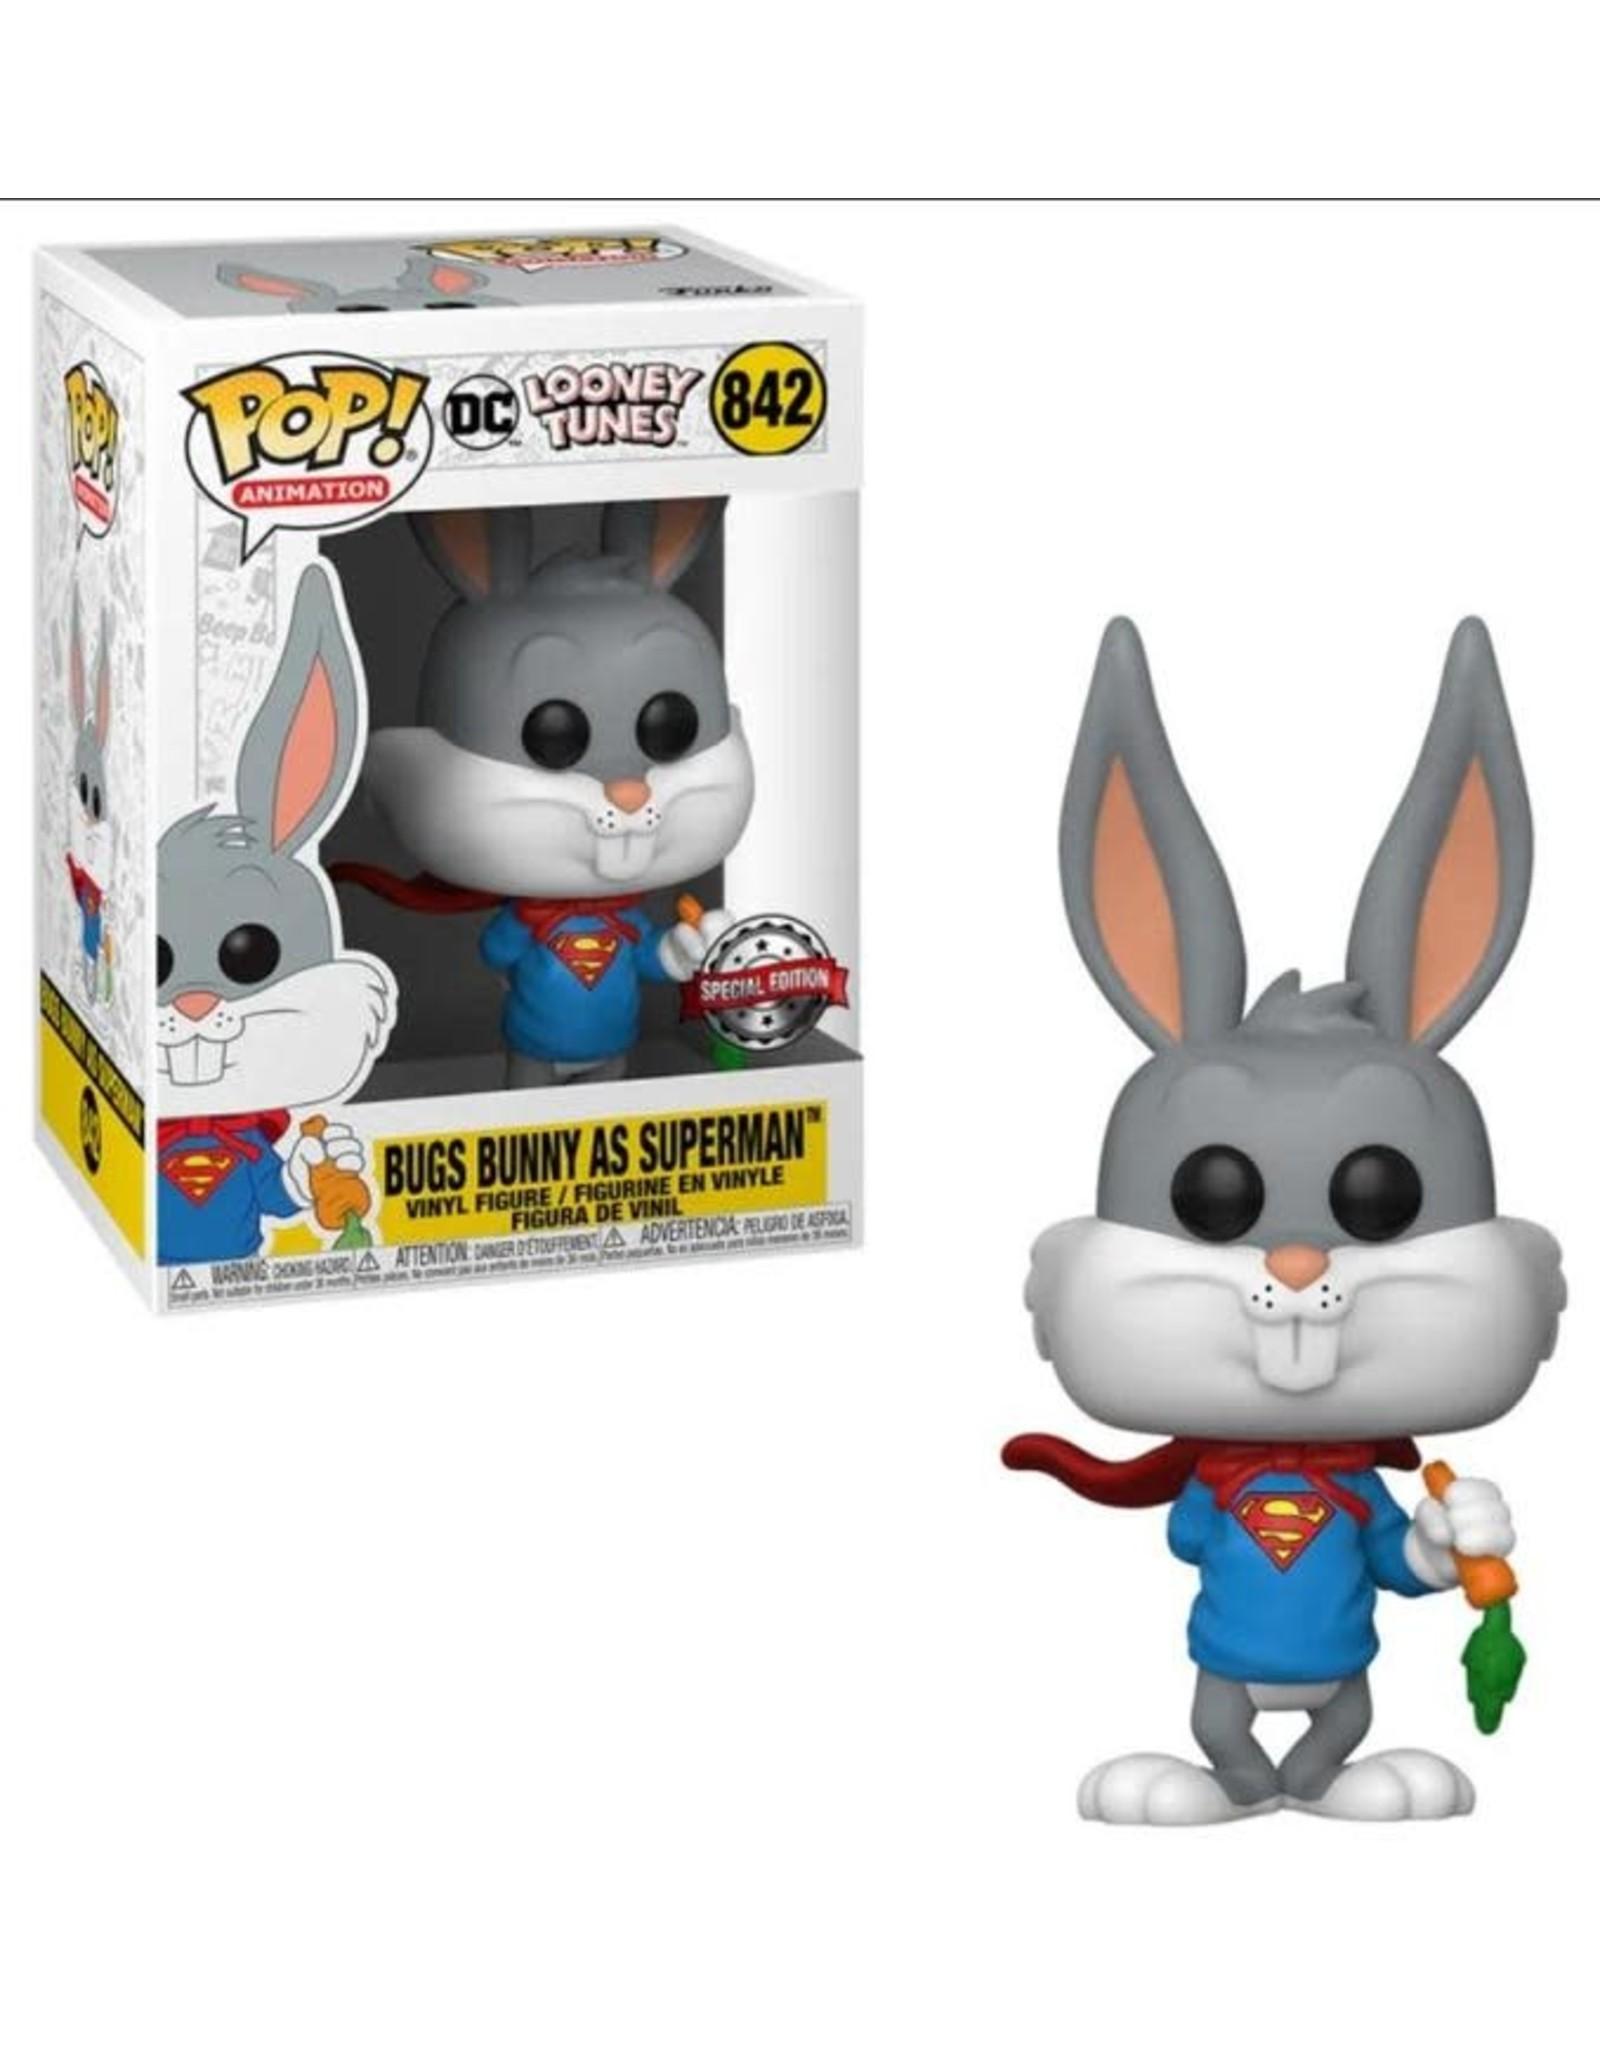 Funko Pop! Funko Pop! Animation nr842 Bugs Bunny as Superman